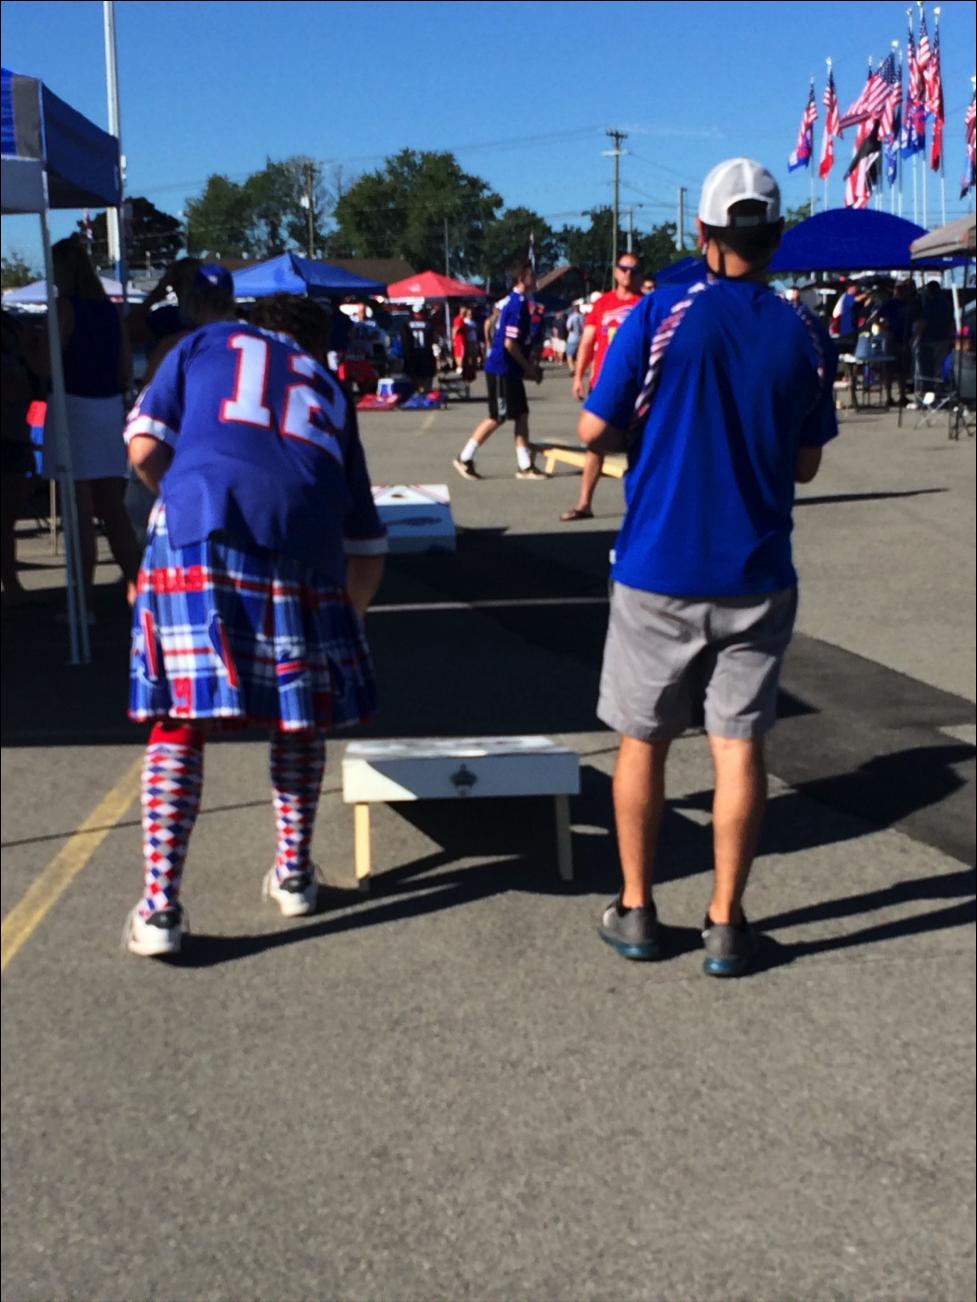 1fe03da9 Everyday Sociology Blog: The Behavior of Buffalo Bills Fans: A Mini ...